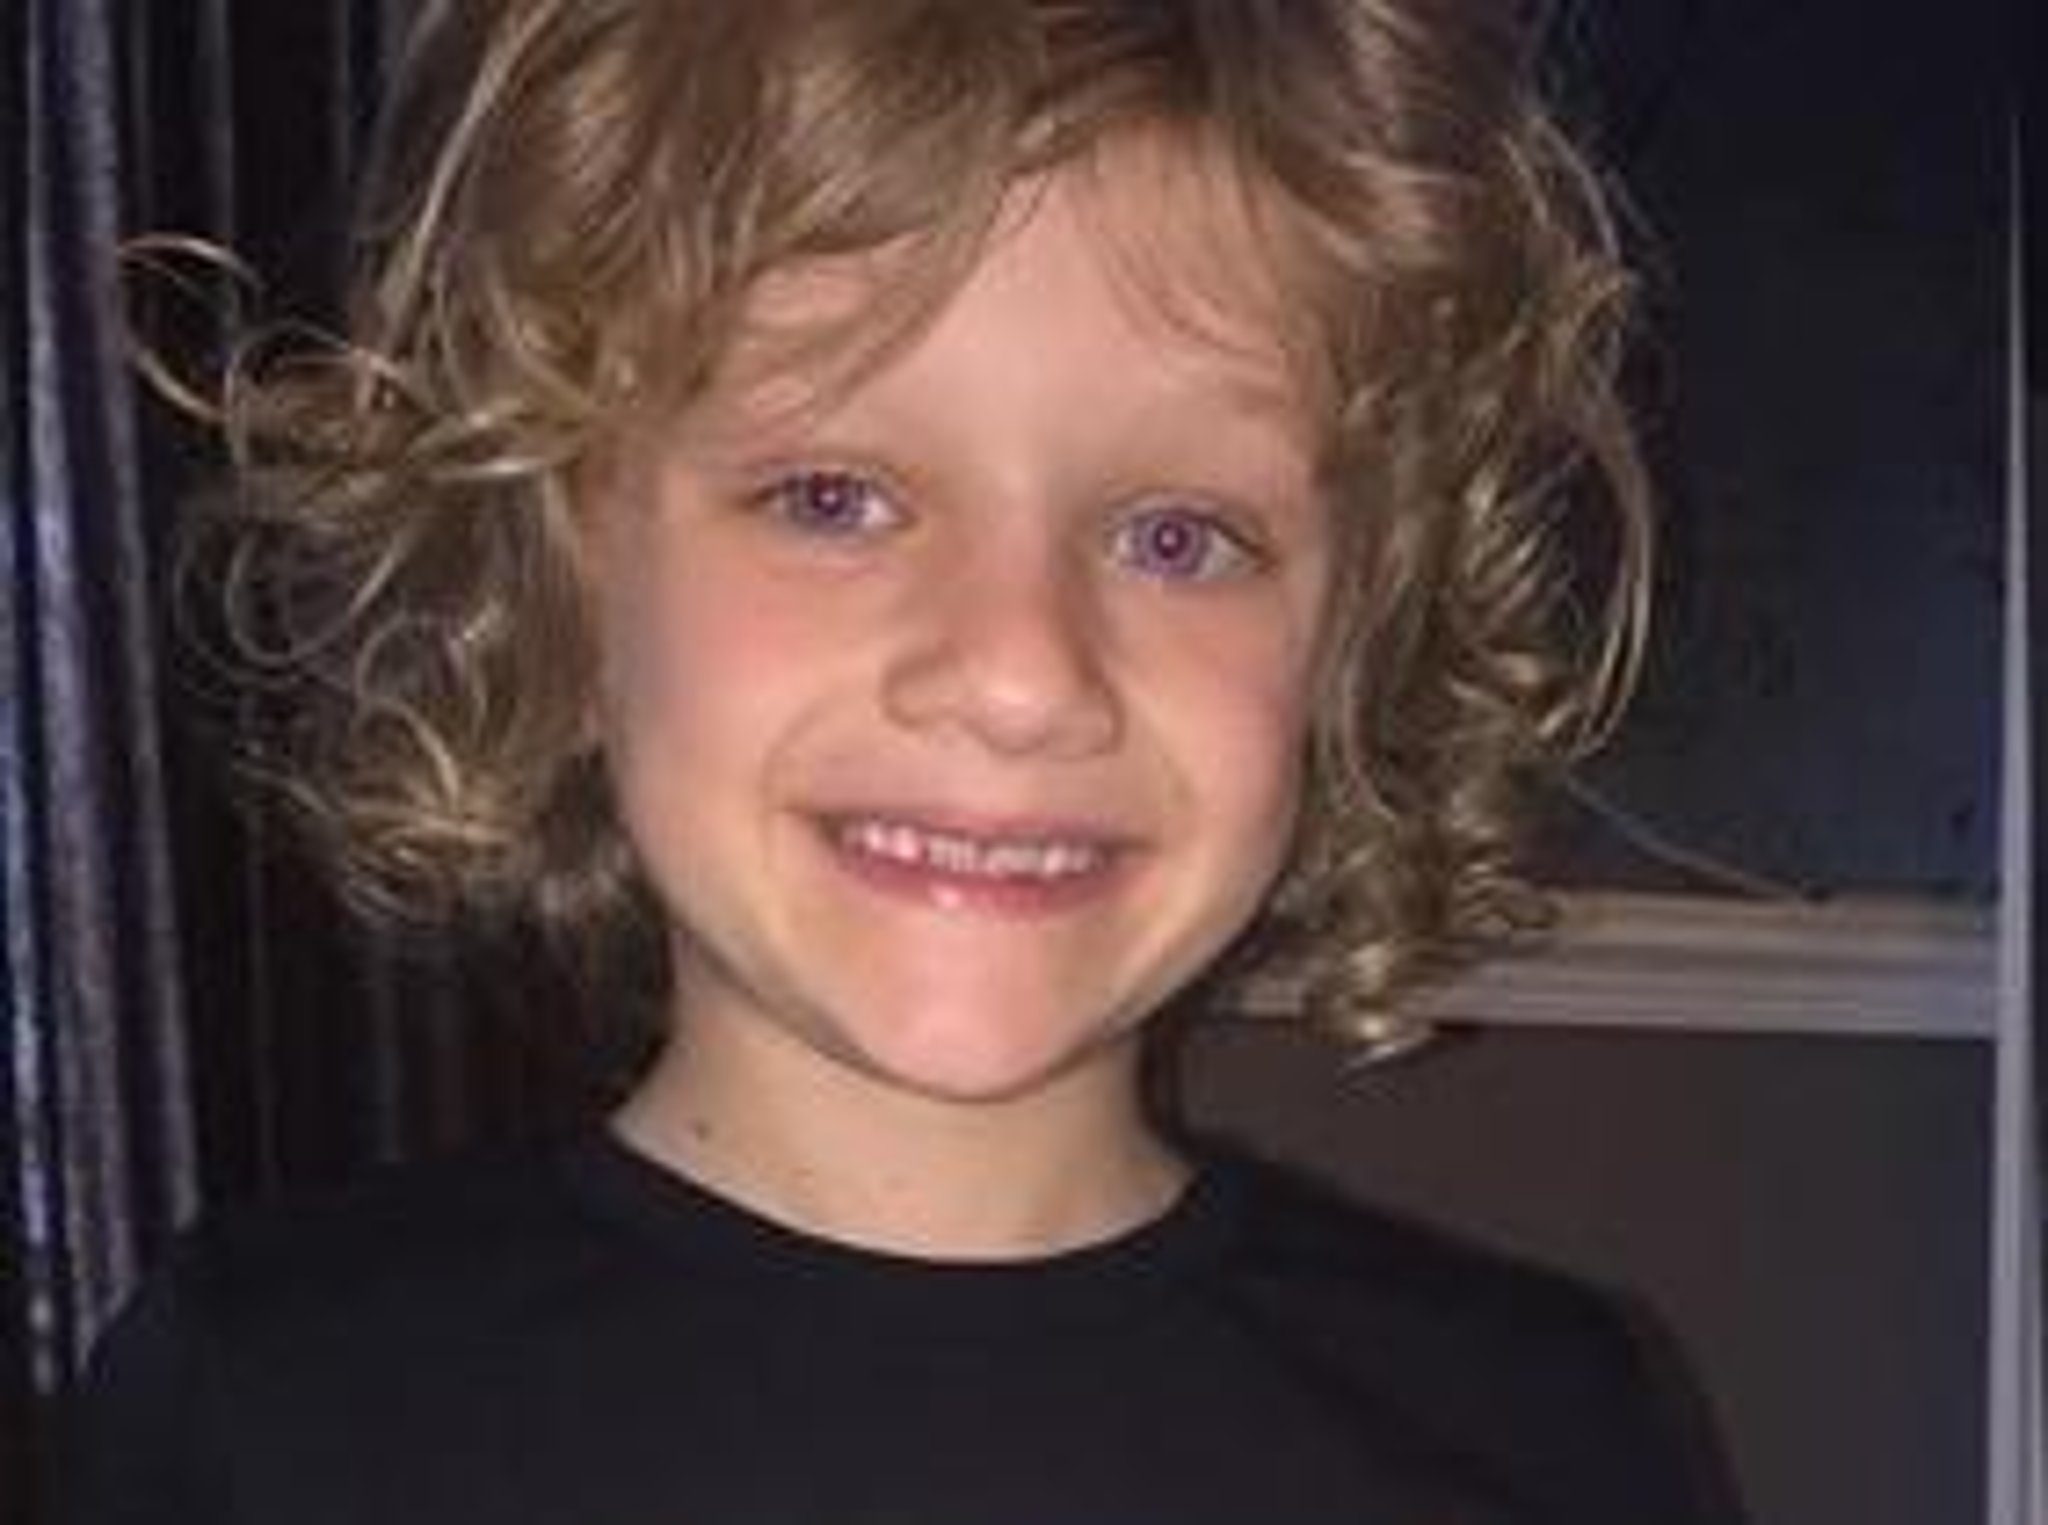 boy struck by lightning - photo #4